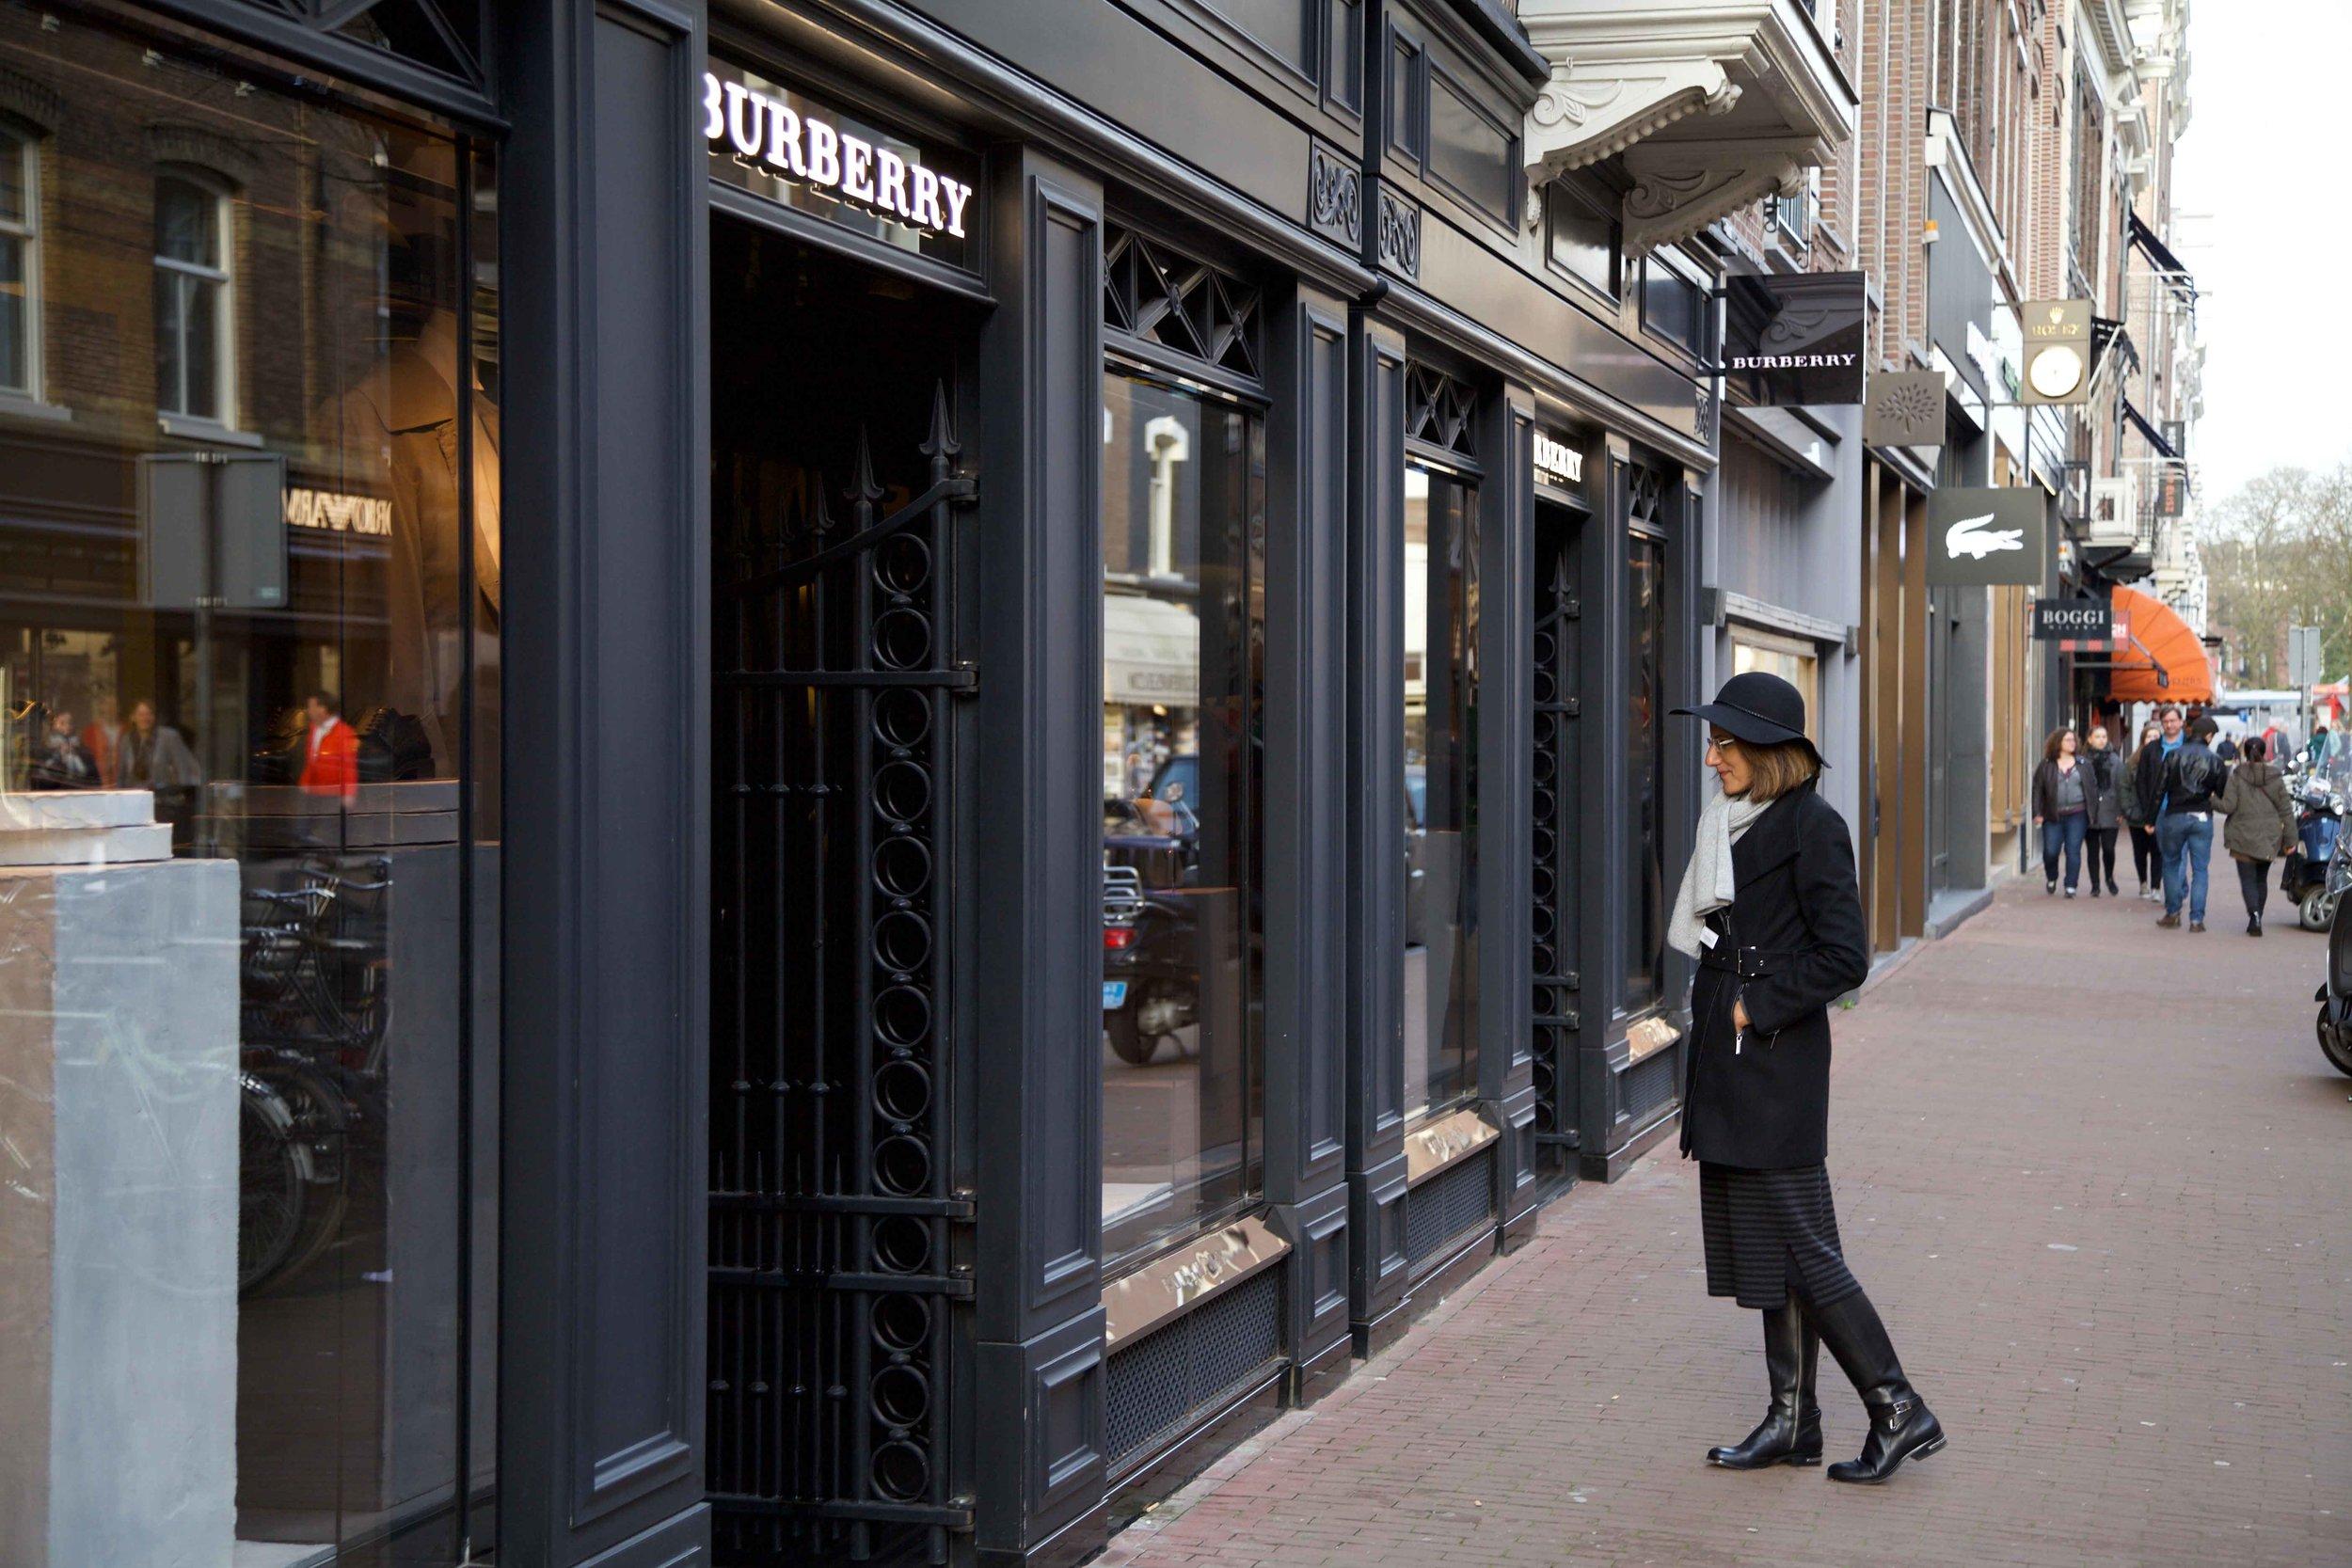 Burberry,P.C. Hooftstraat,Amsterdam. Photo: Fabio Ricci. Image: thingstodot.com